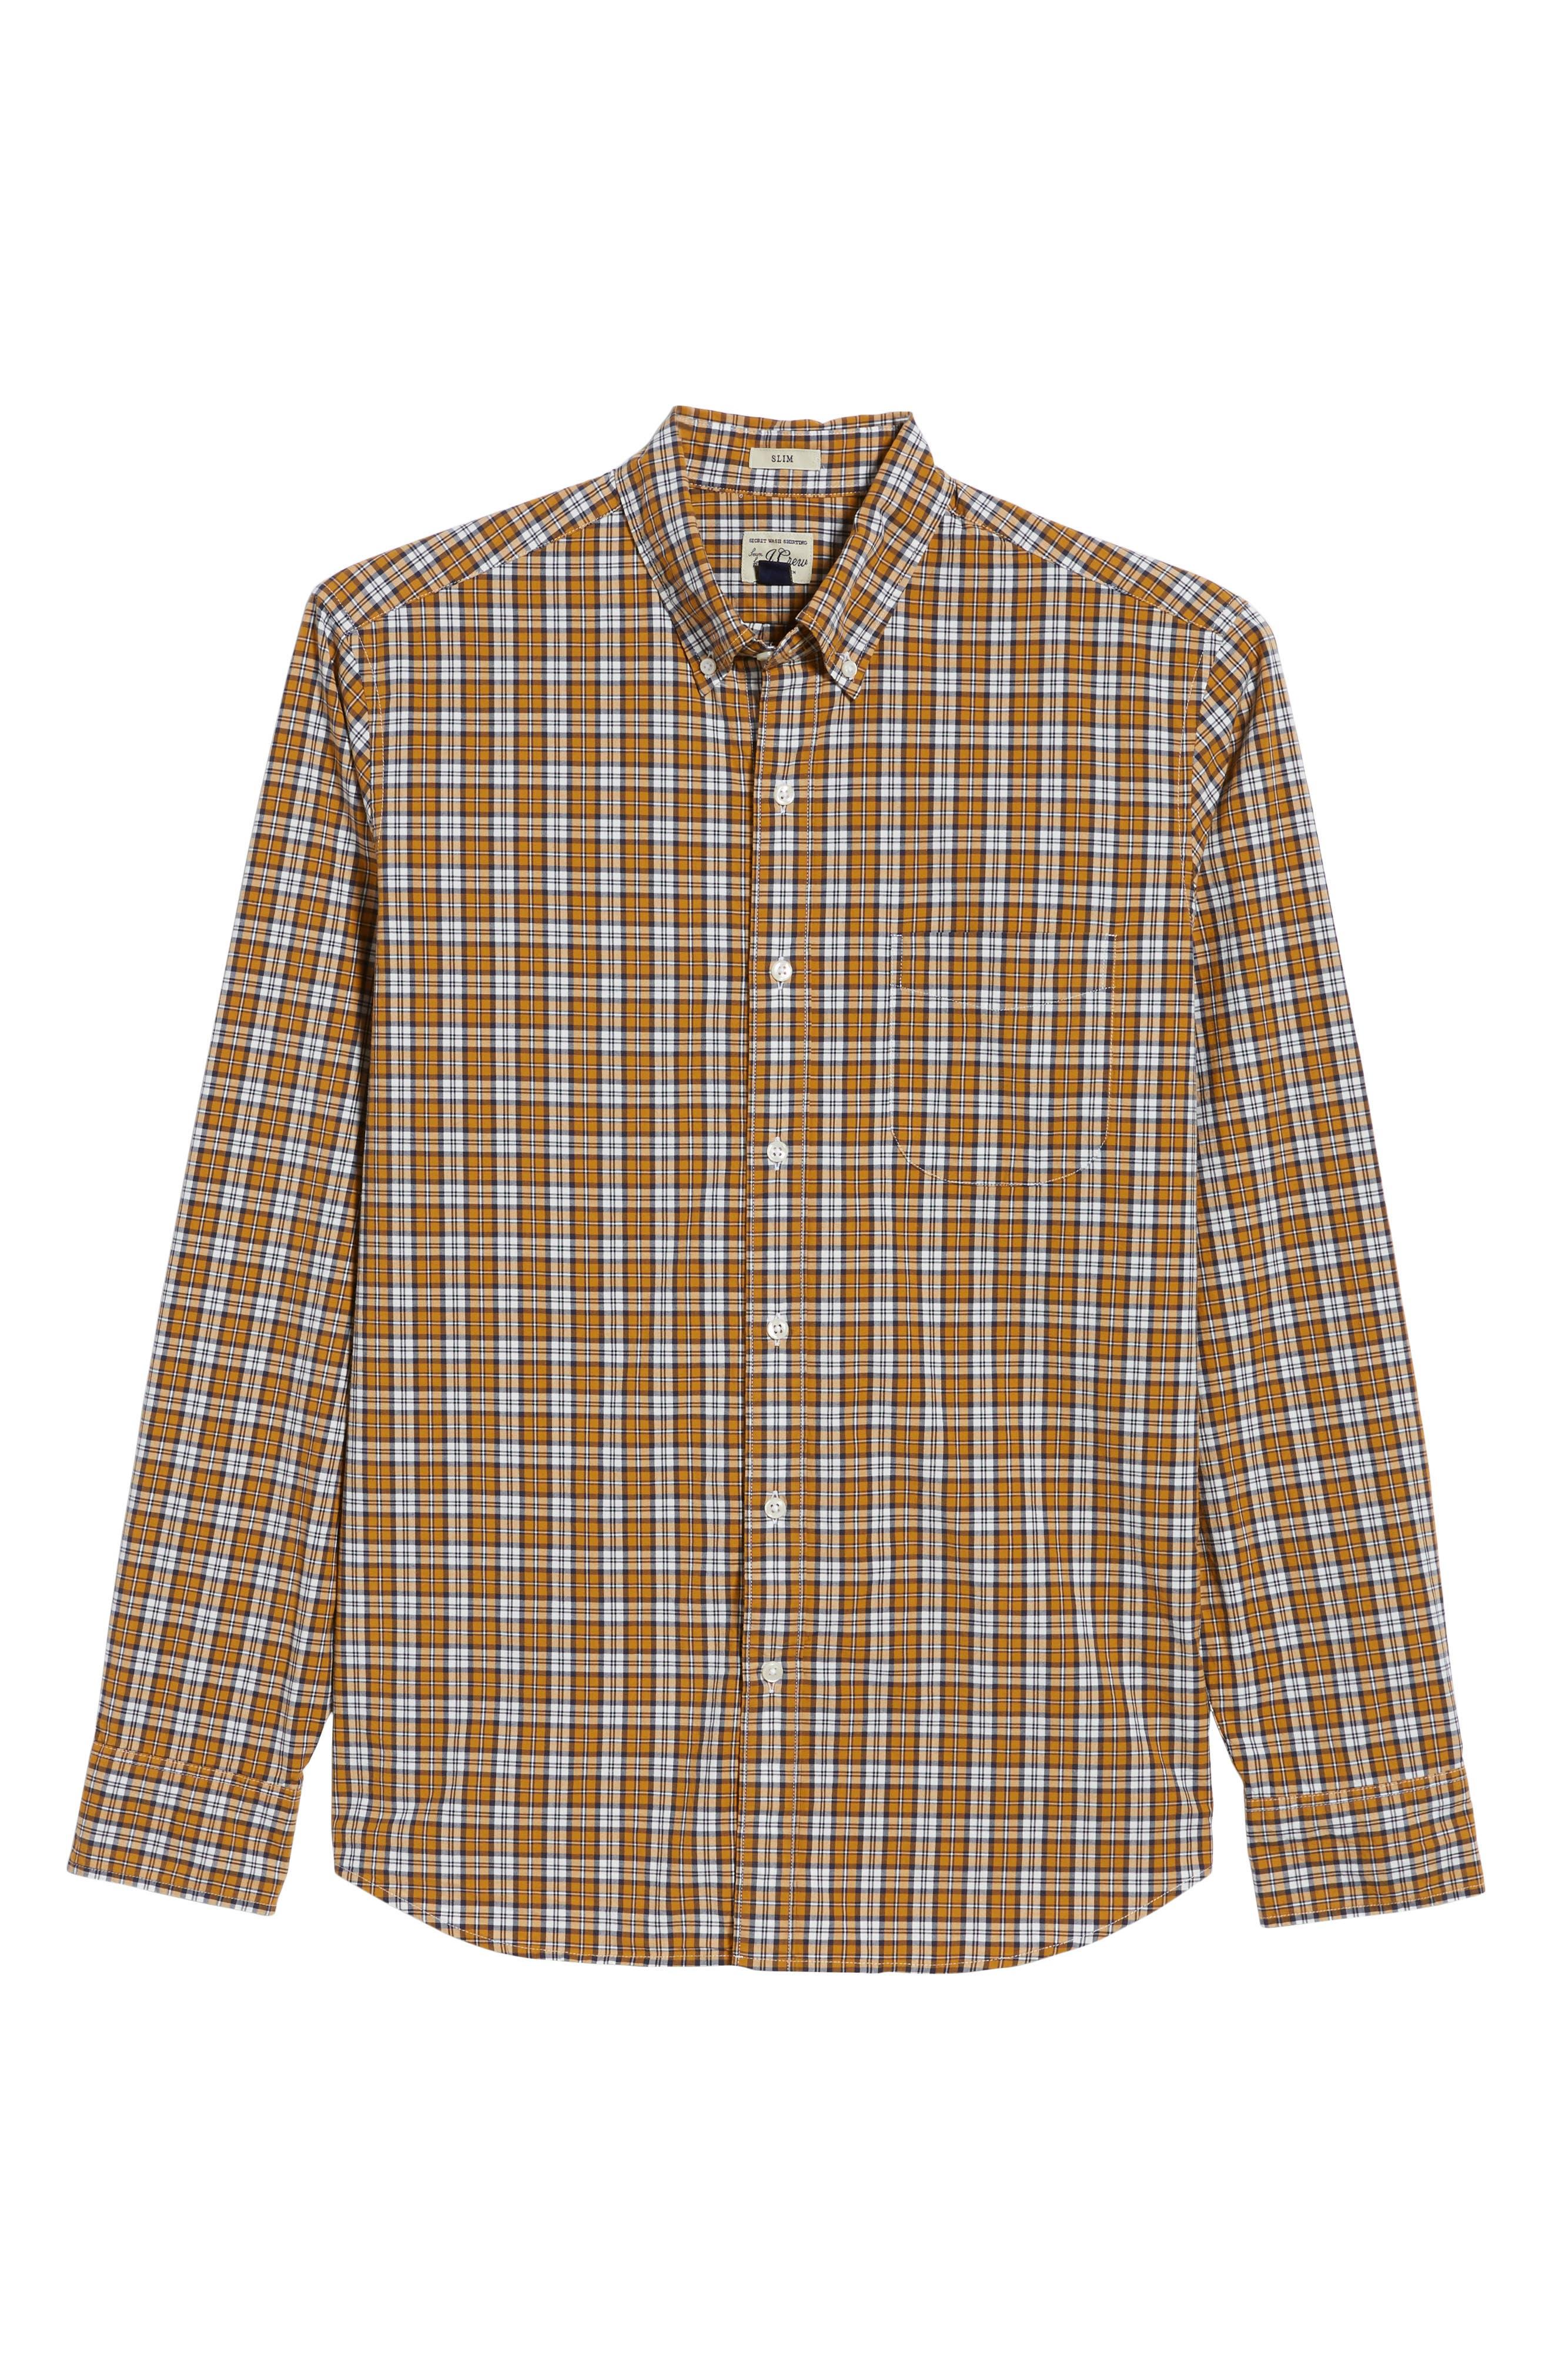 J.Crew Slim Fit Stretch Secret Wash Plaid Sport Shirt,                             Alternate thumbnail 6, color,                             Warm Cider